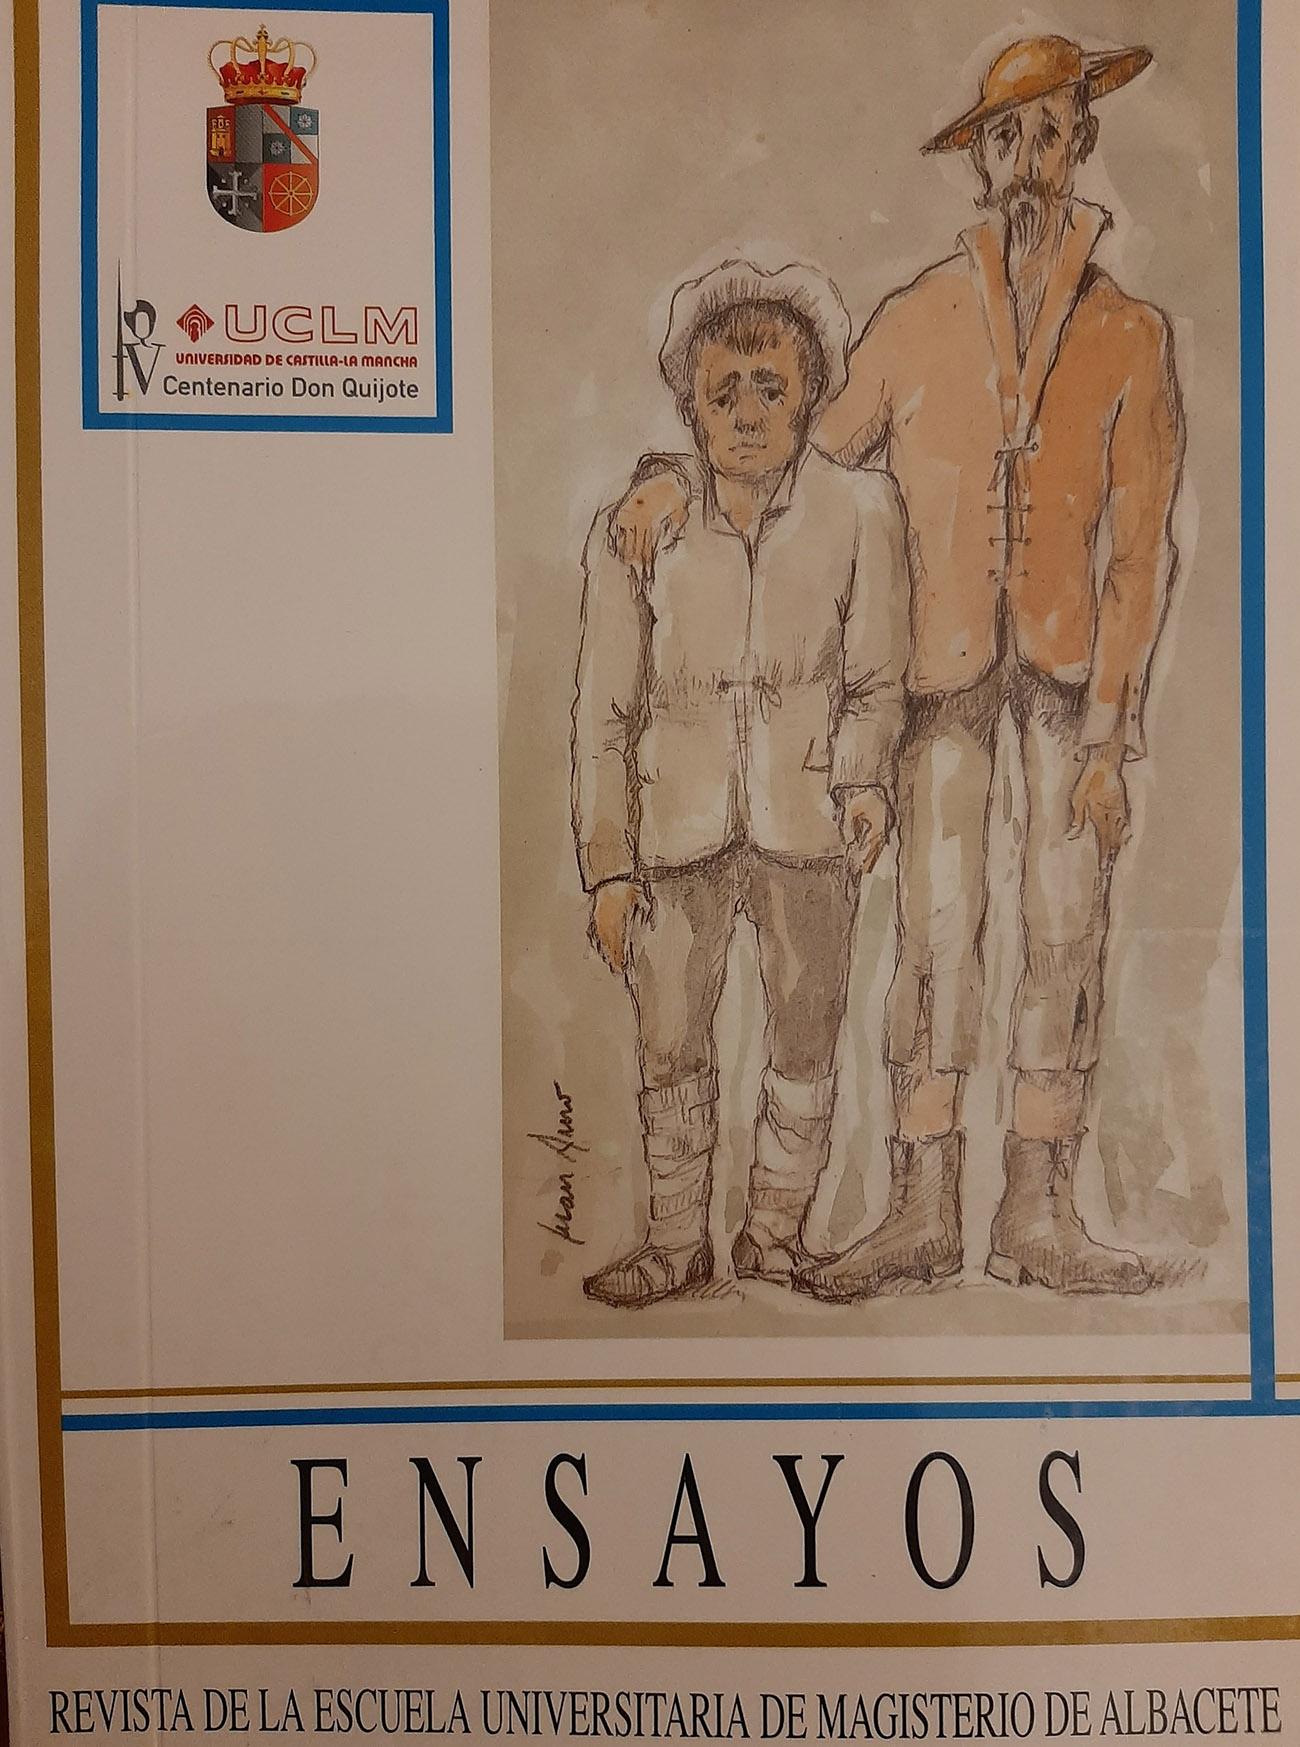 Juan Amo. (2005). Portada Revista Ensayos.